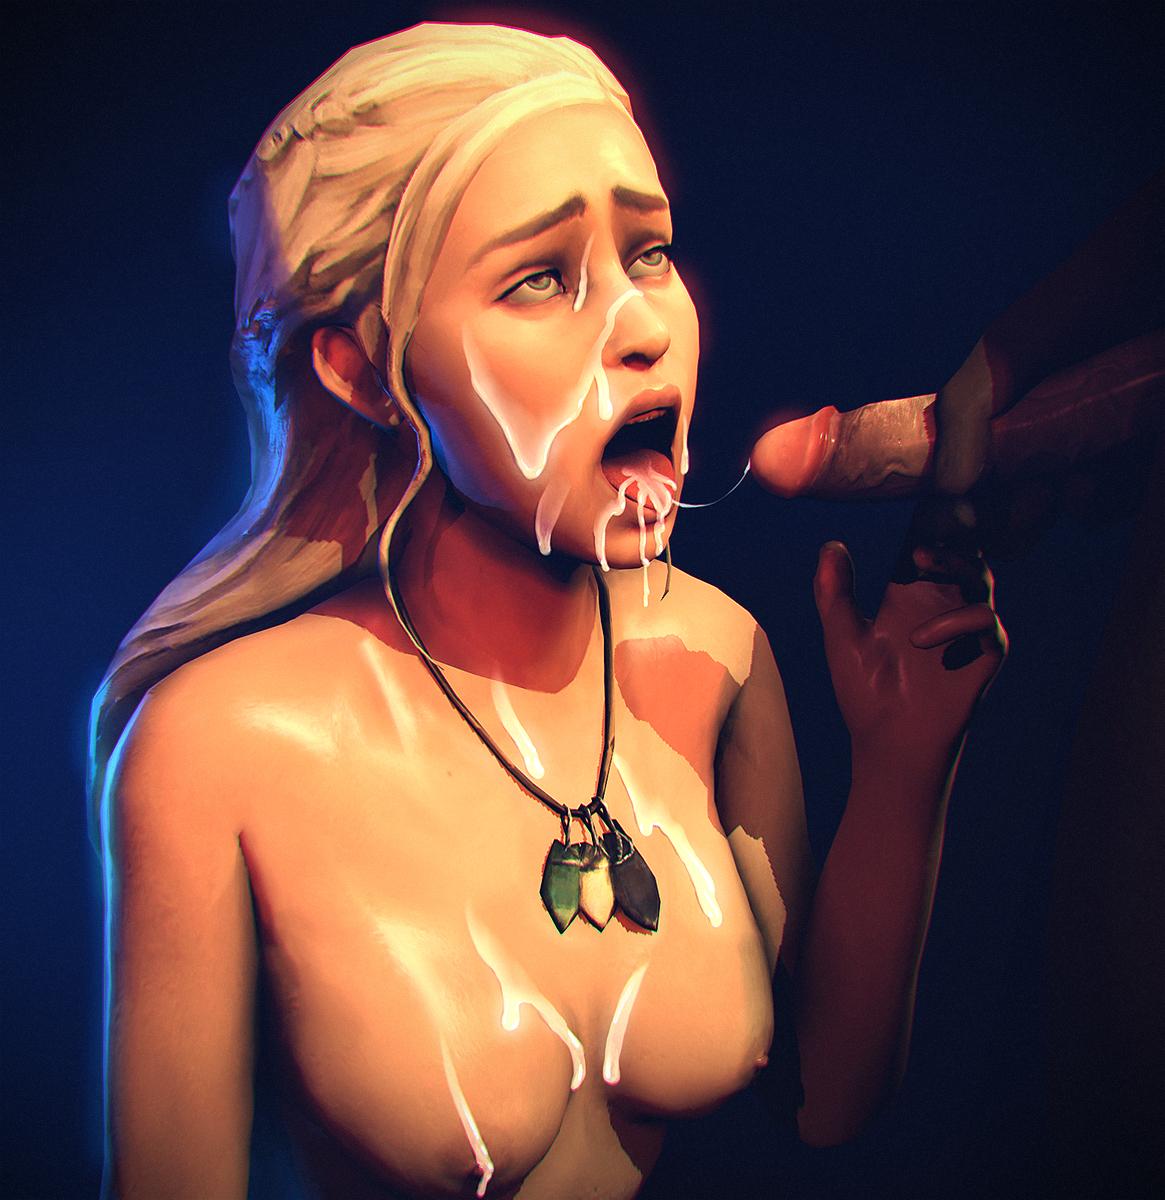 daenerys porn